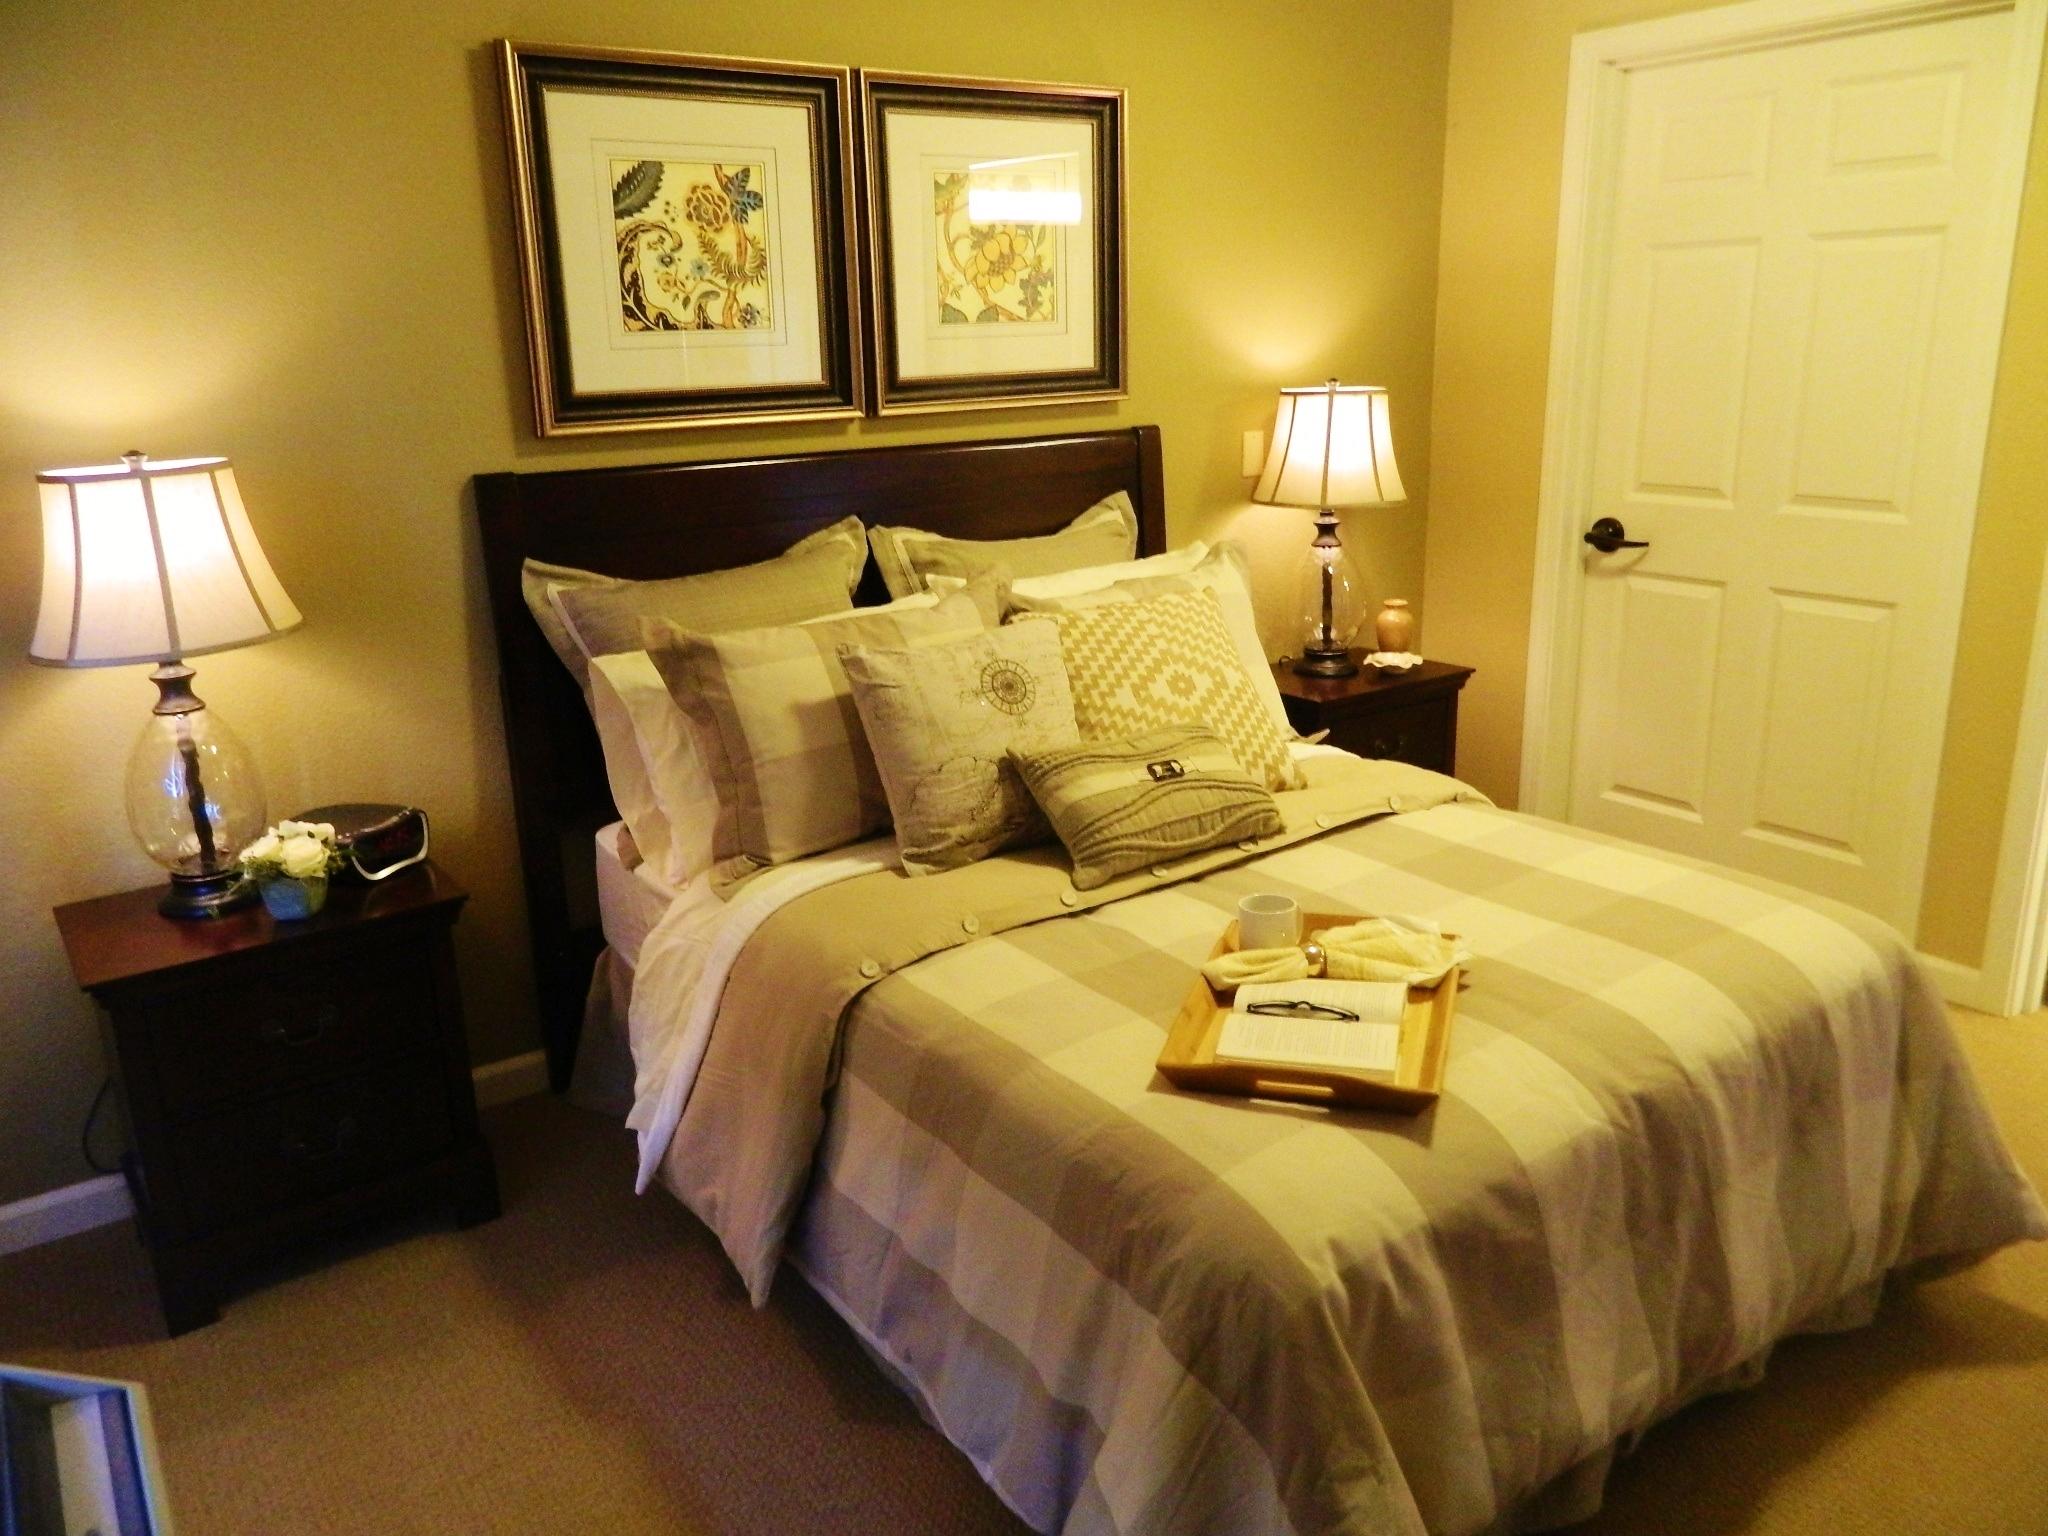 Small Bedroom Design - Think Hotel